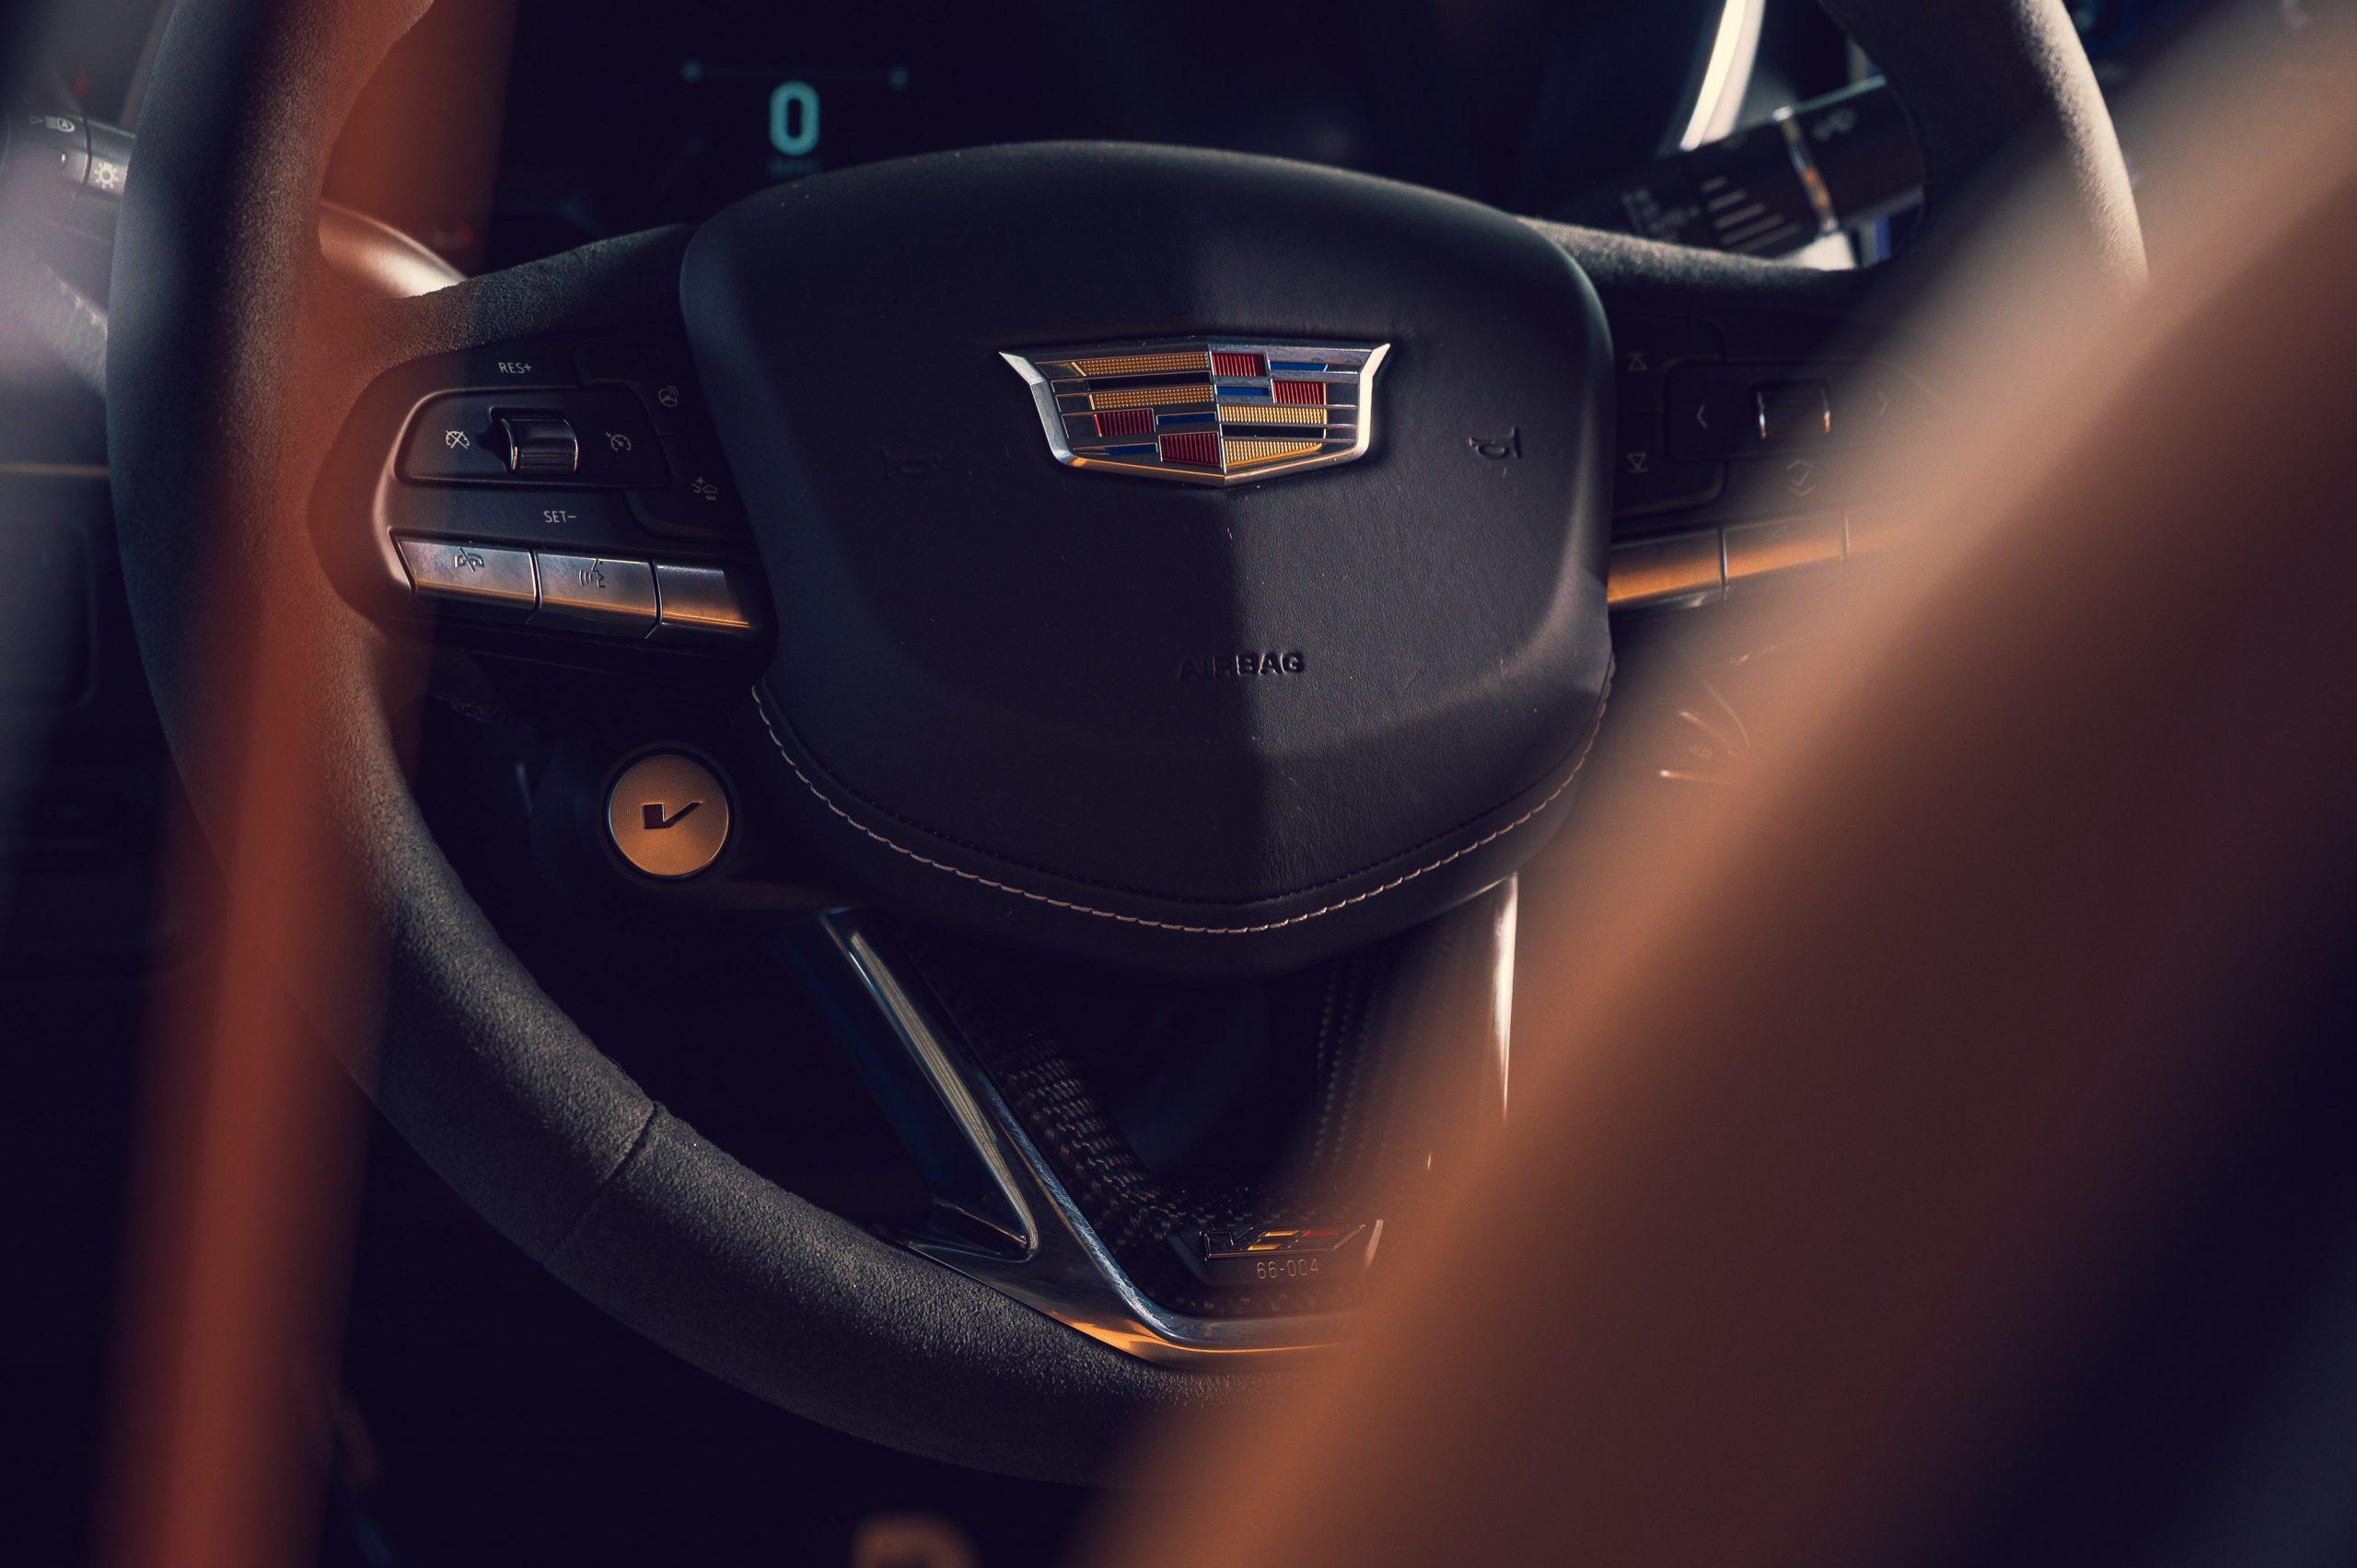 2022 Cadillac CT5-V Blackwing steering wheel